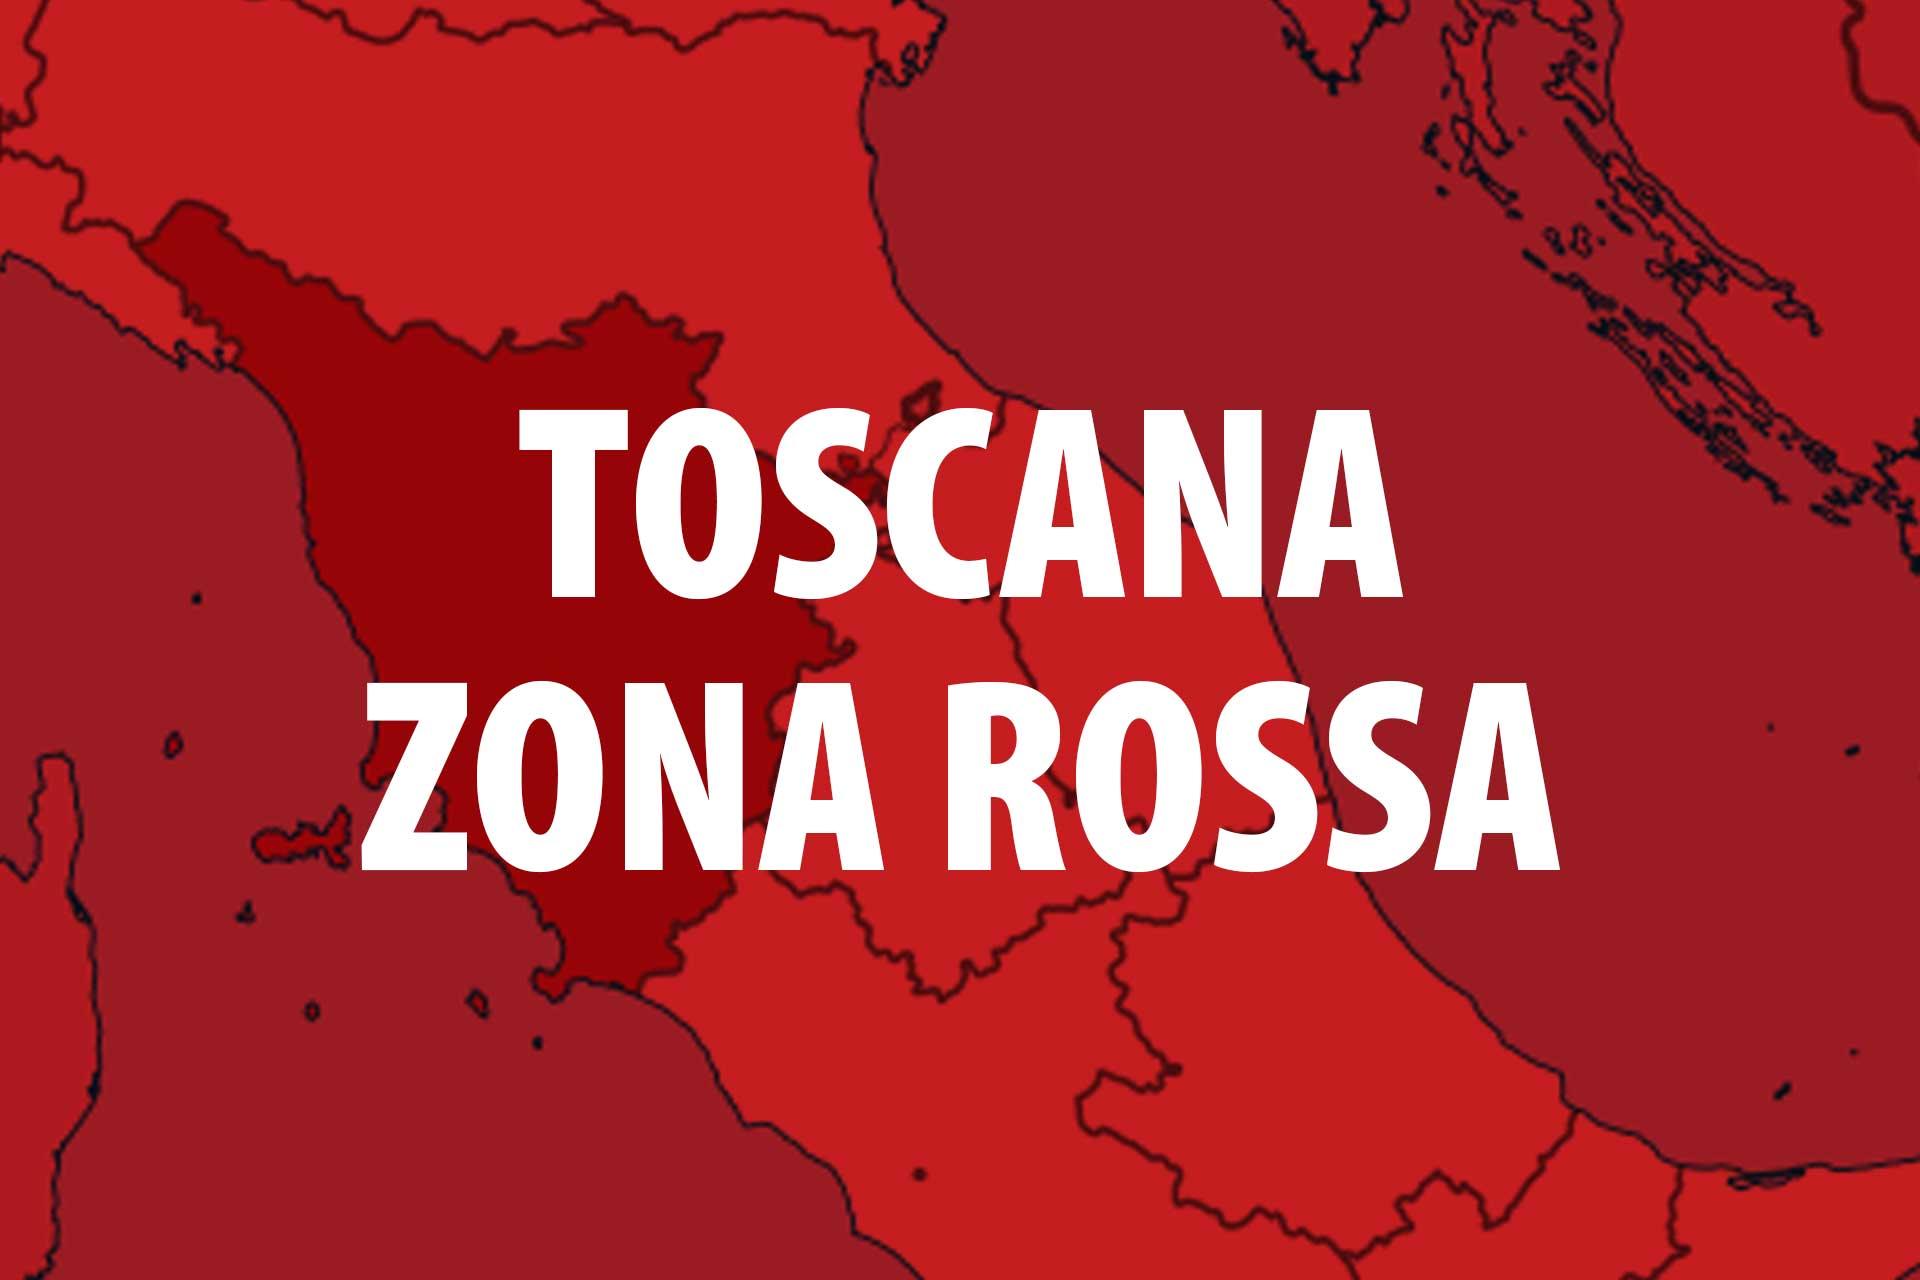 MISURE VALIDE IN ZONA ROSSA DAL 29 AL 6 APRILE